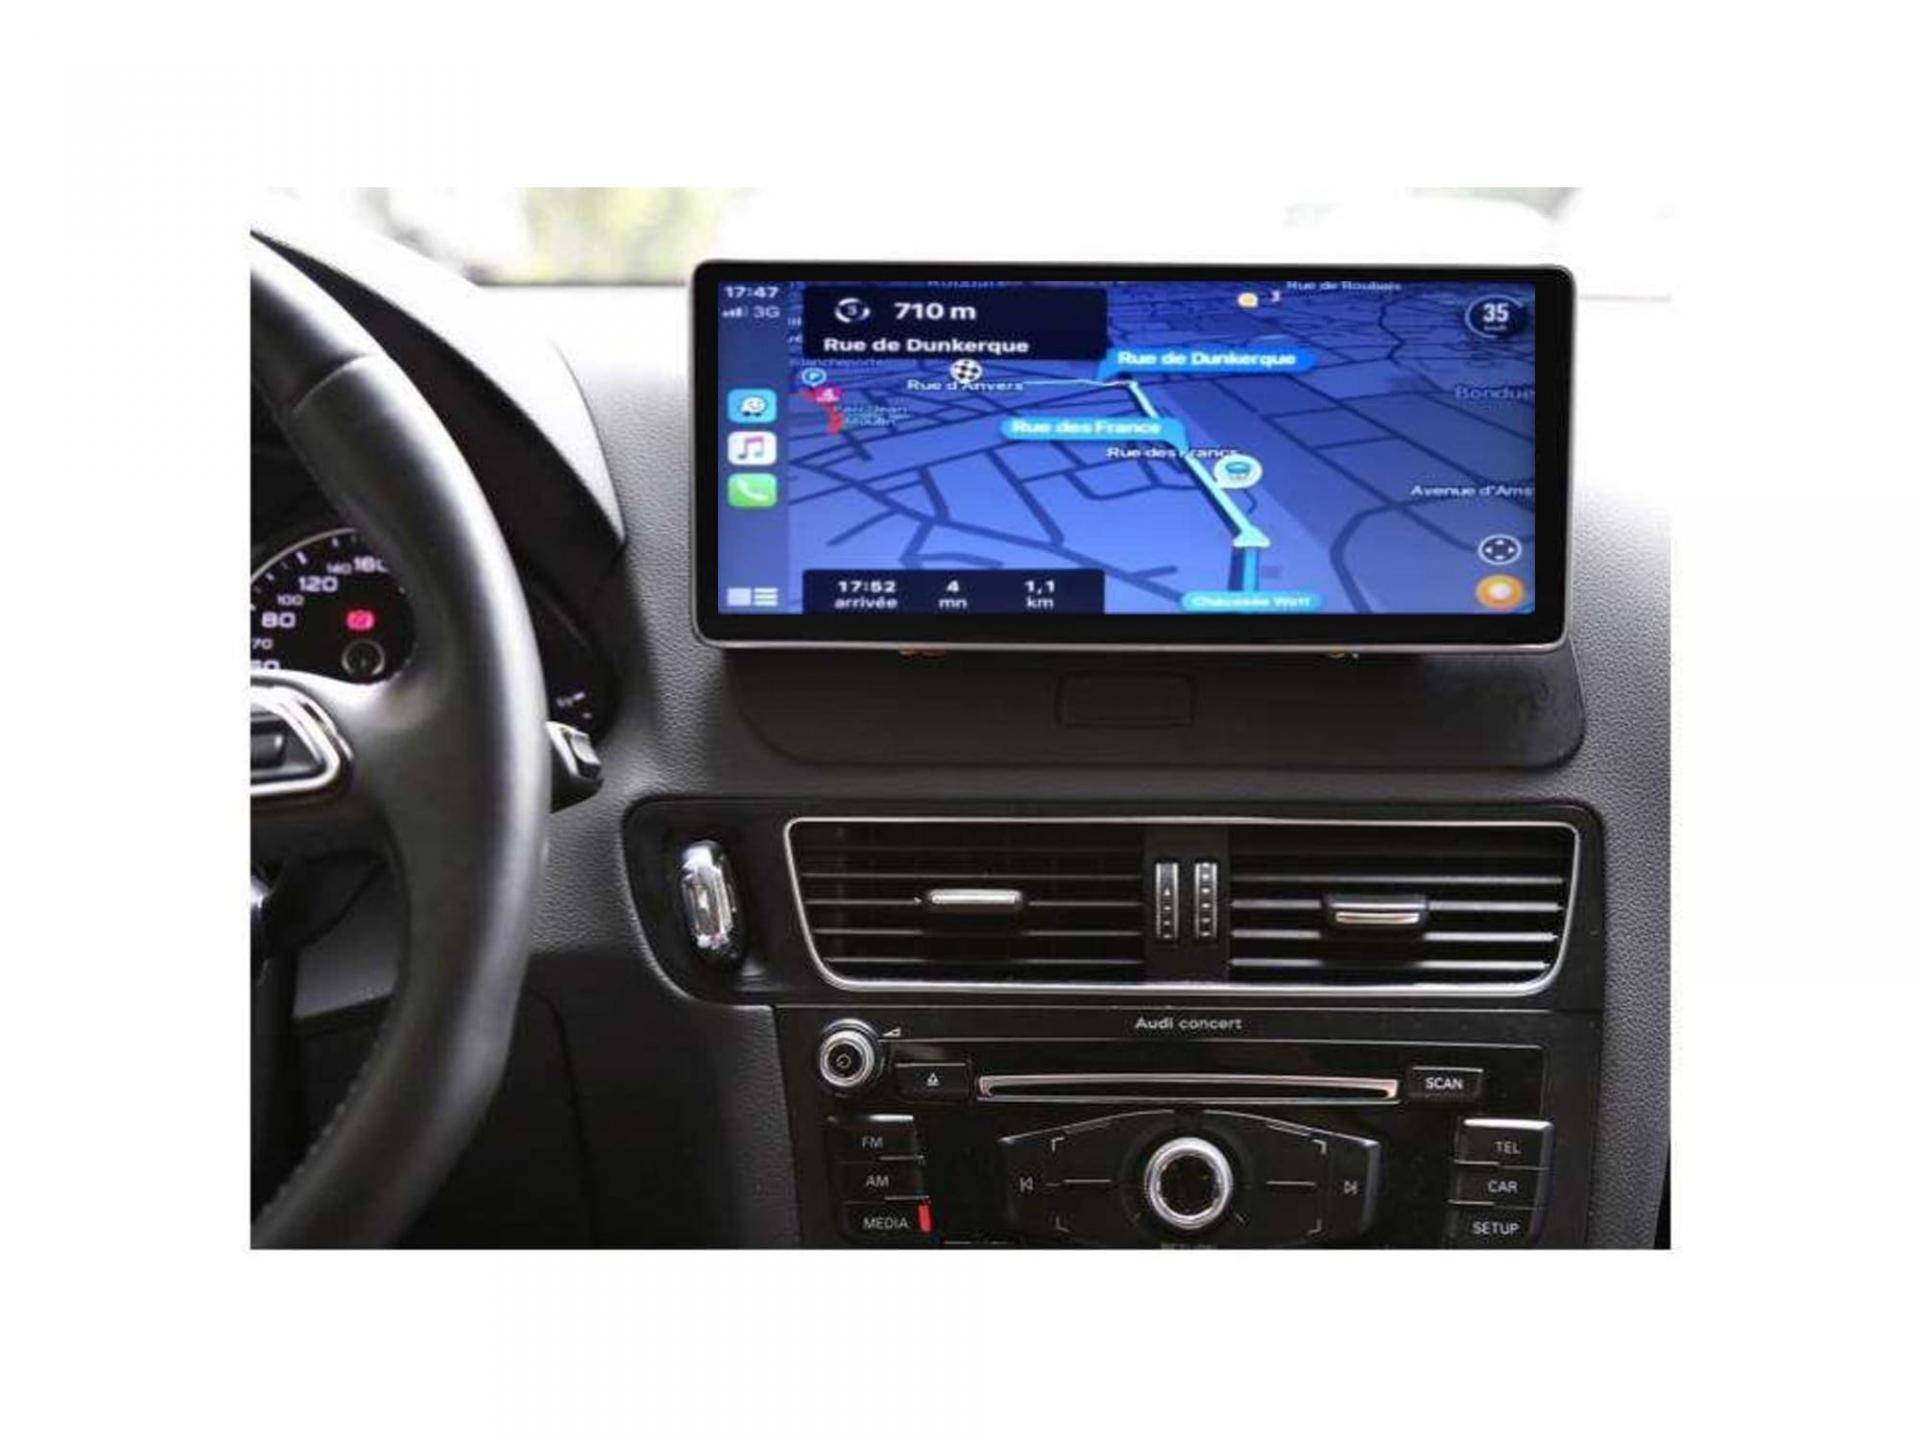 Audi a4 a5 a6 q7 q5 q3 autoradio gps carplay android auto gps bluetooth 20